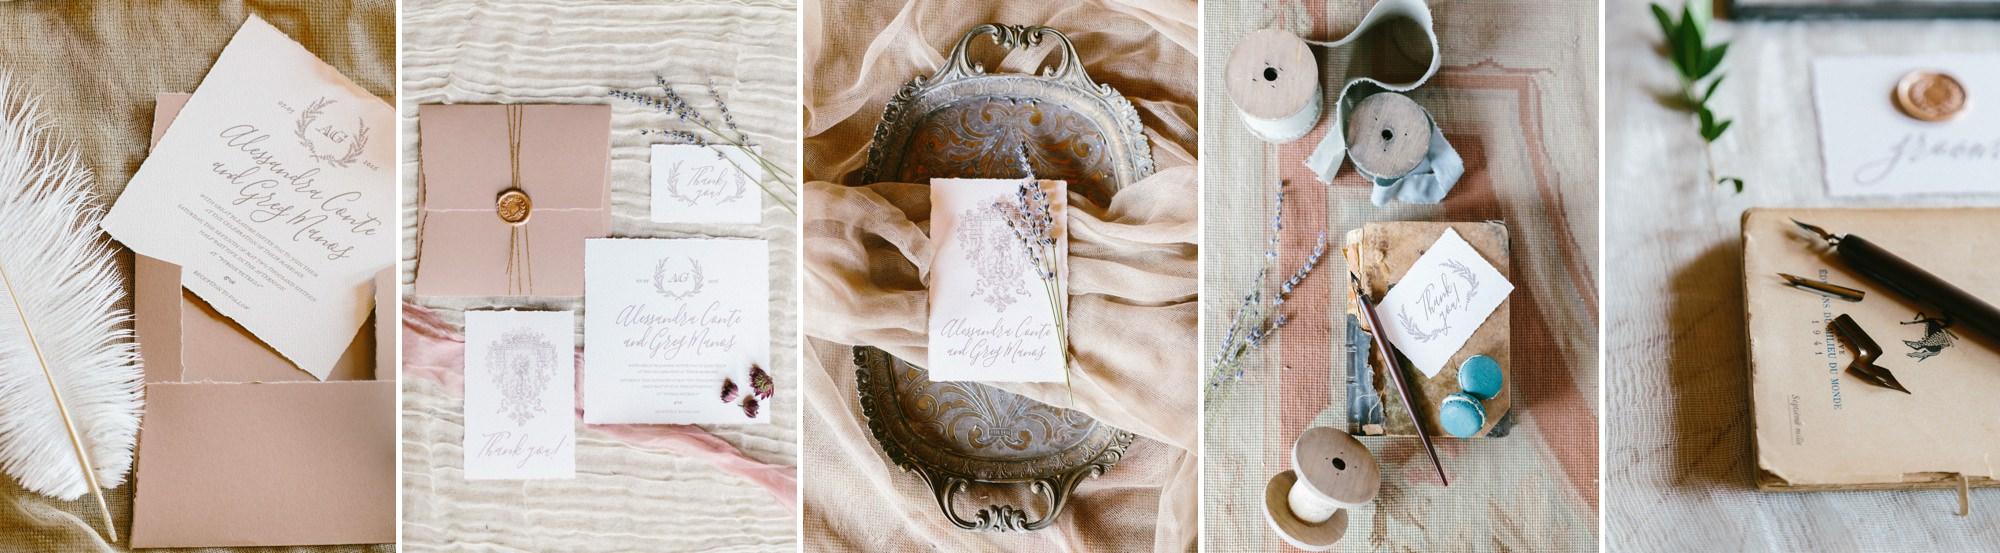 trending wedding photography ideas in Greece